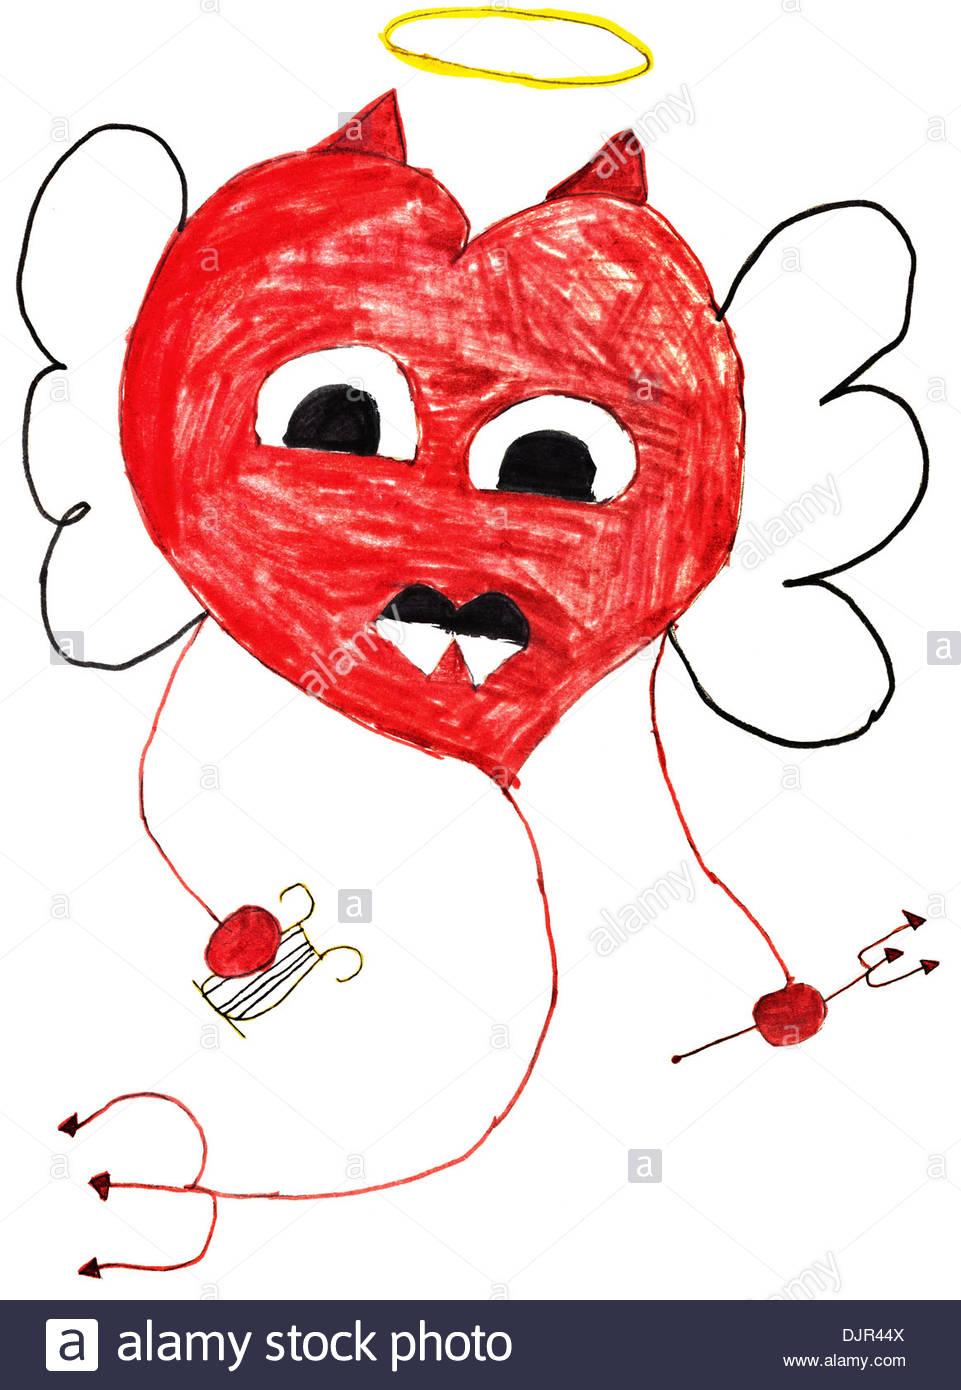 961x1390 Children Drawing